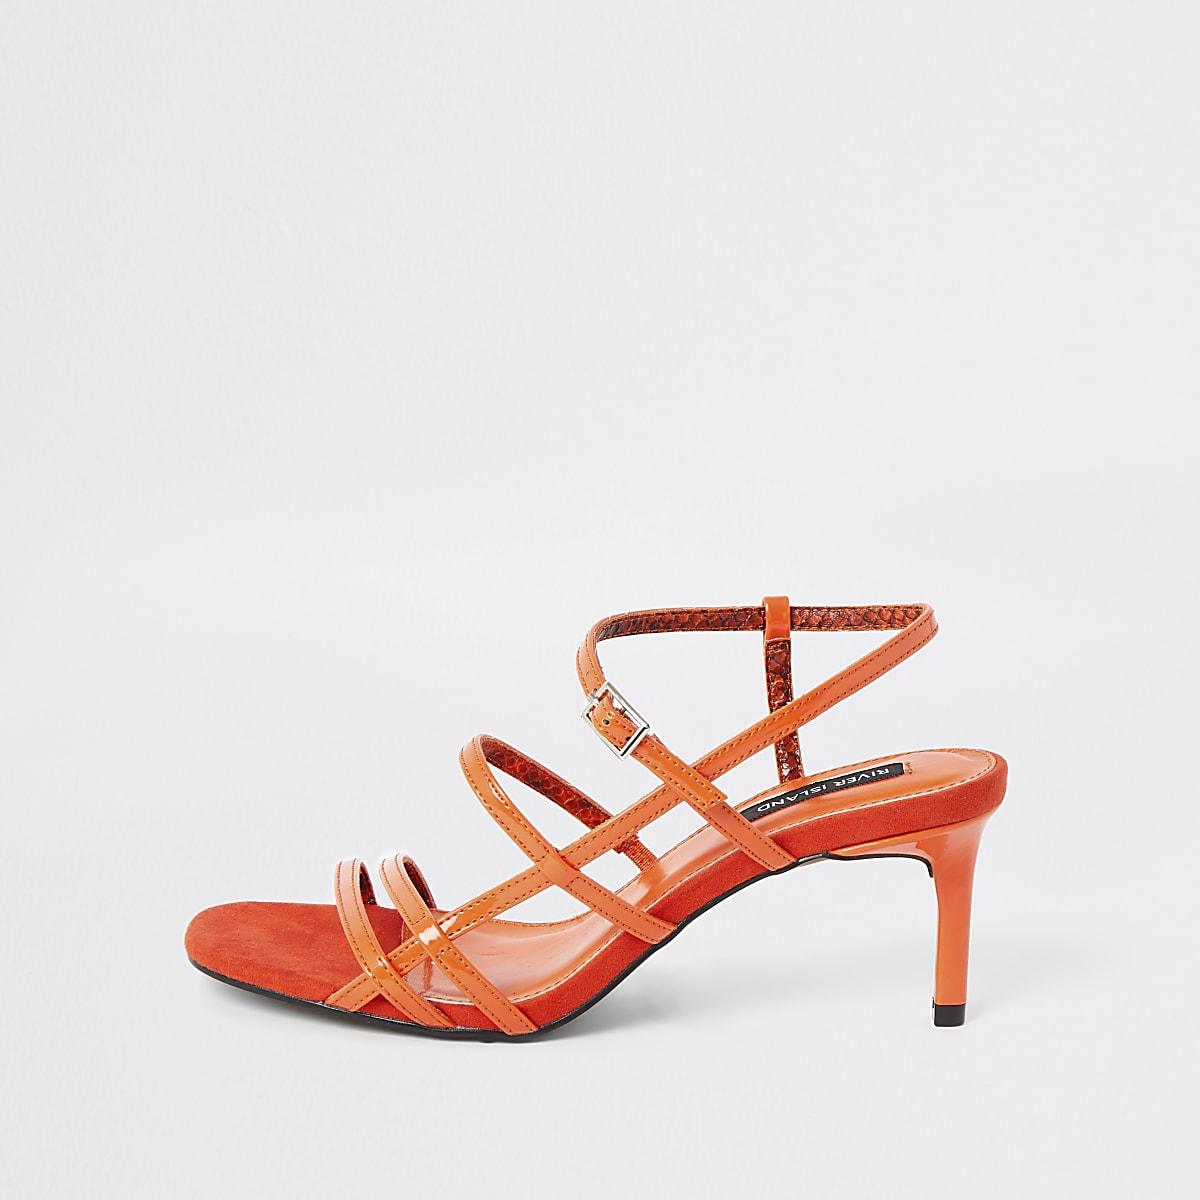 Oranje smalle sandalen met bndjes en hoge hakken